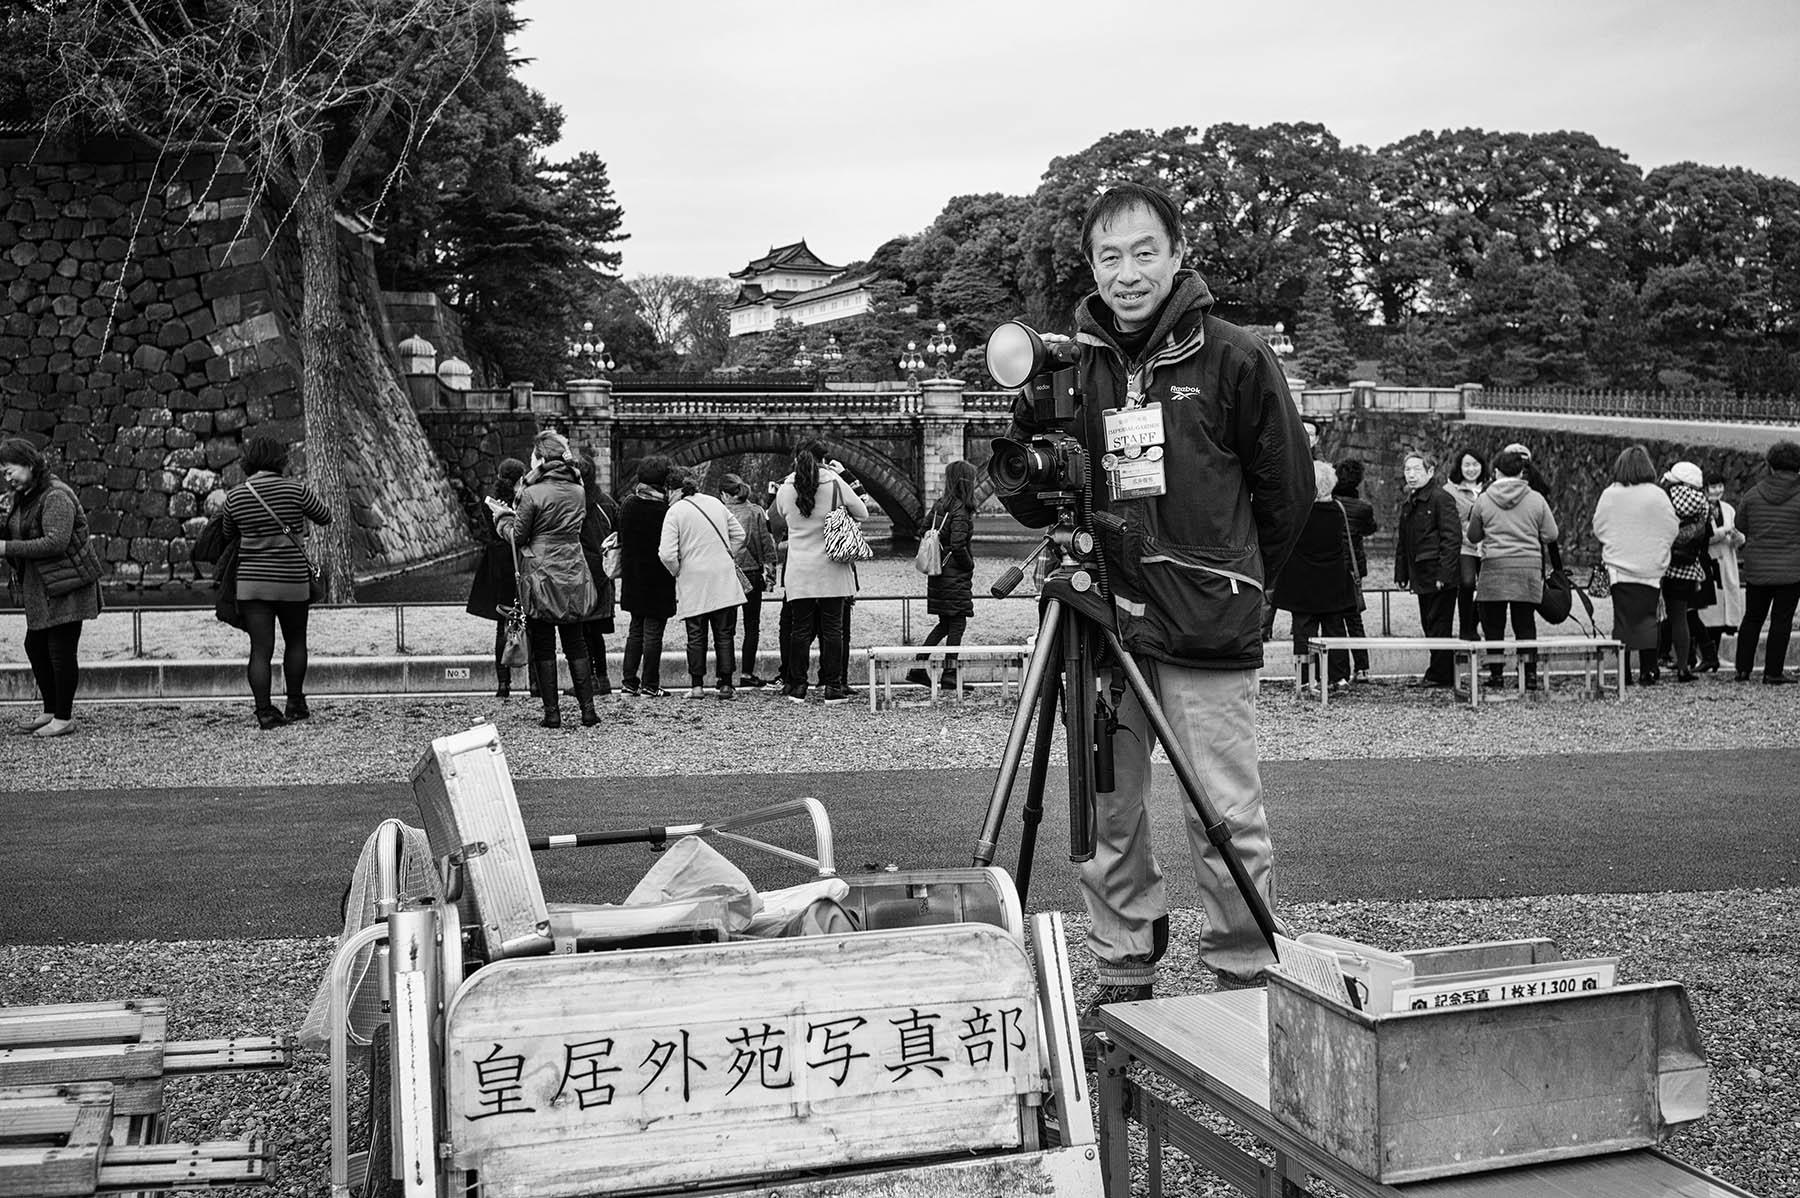 皇居外苑写真部〜皇居二重橋にて〜_c0028861_2037152.jpg